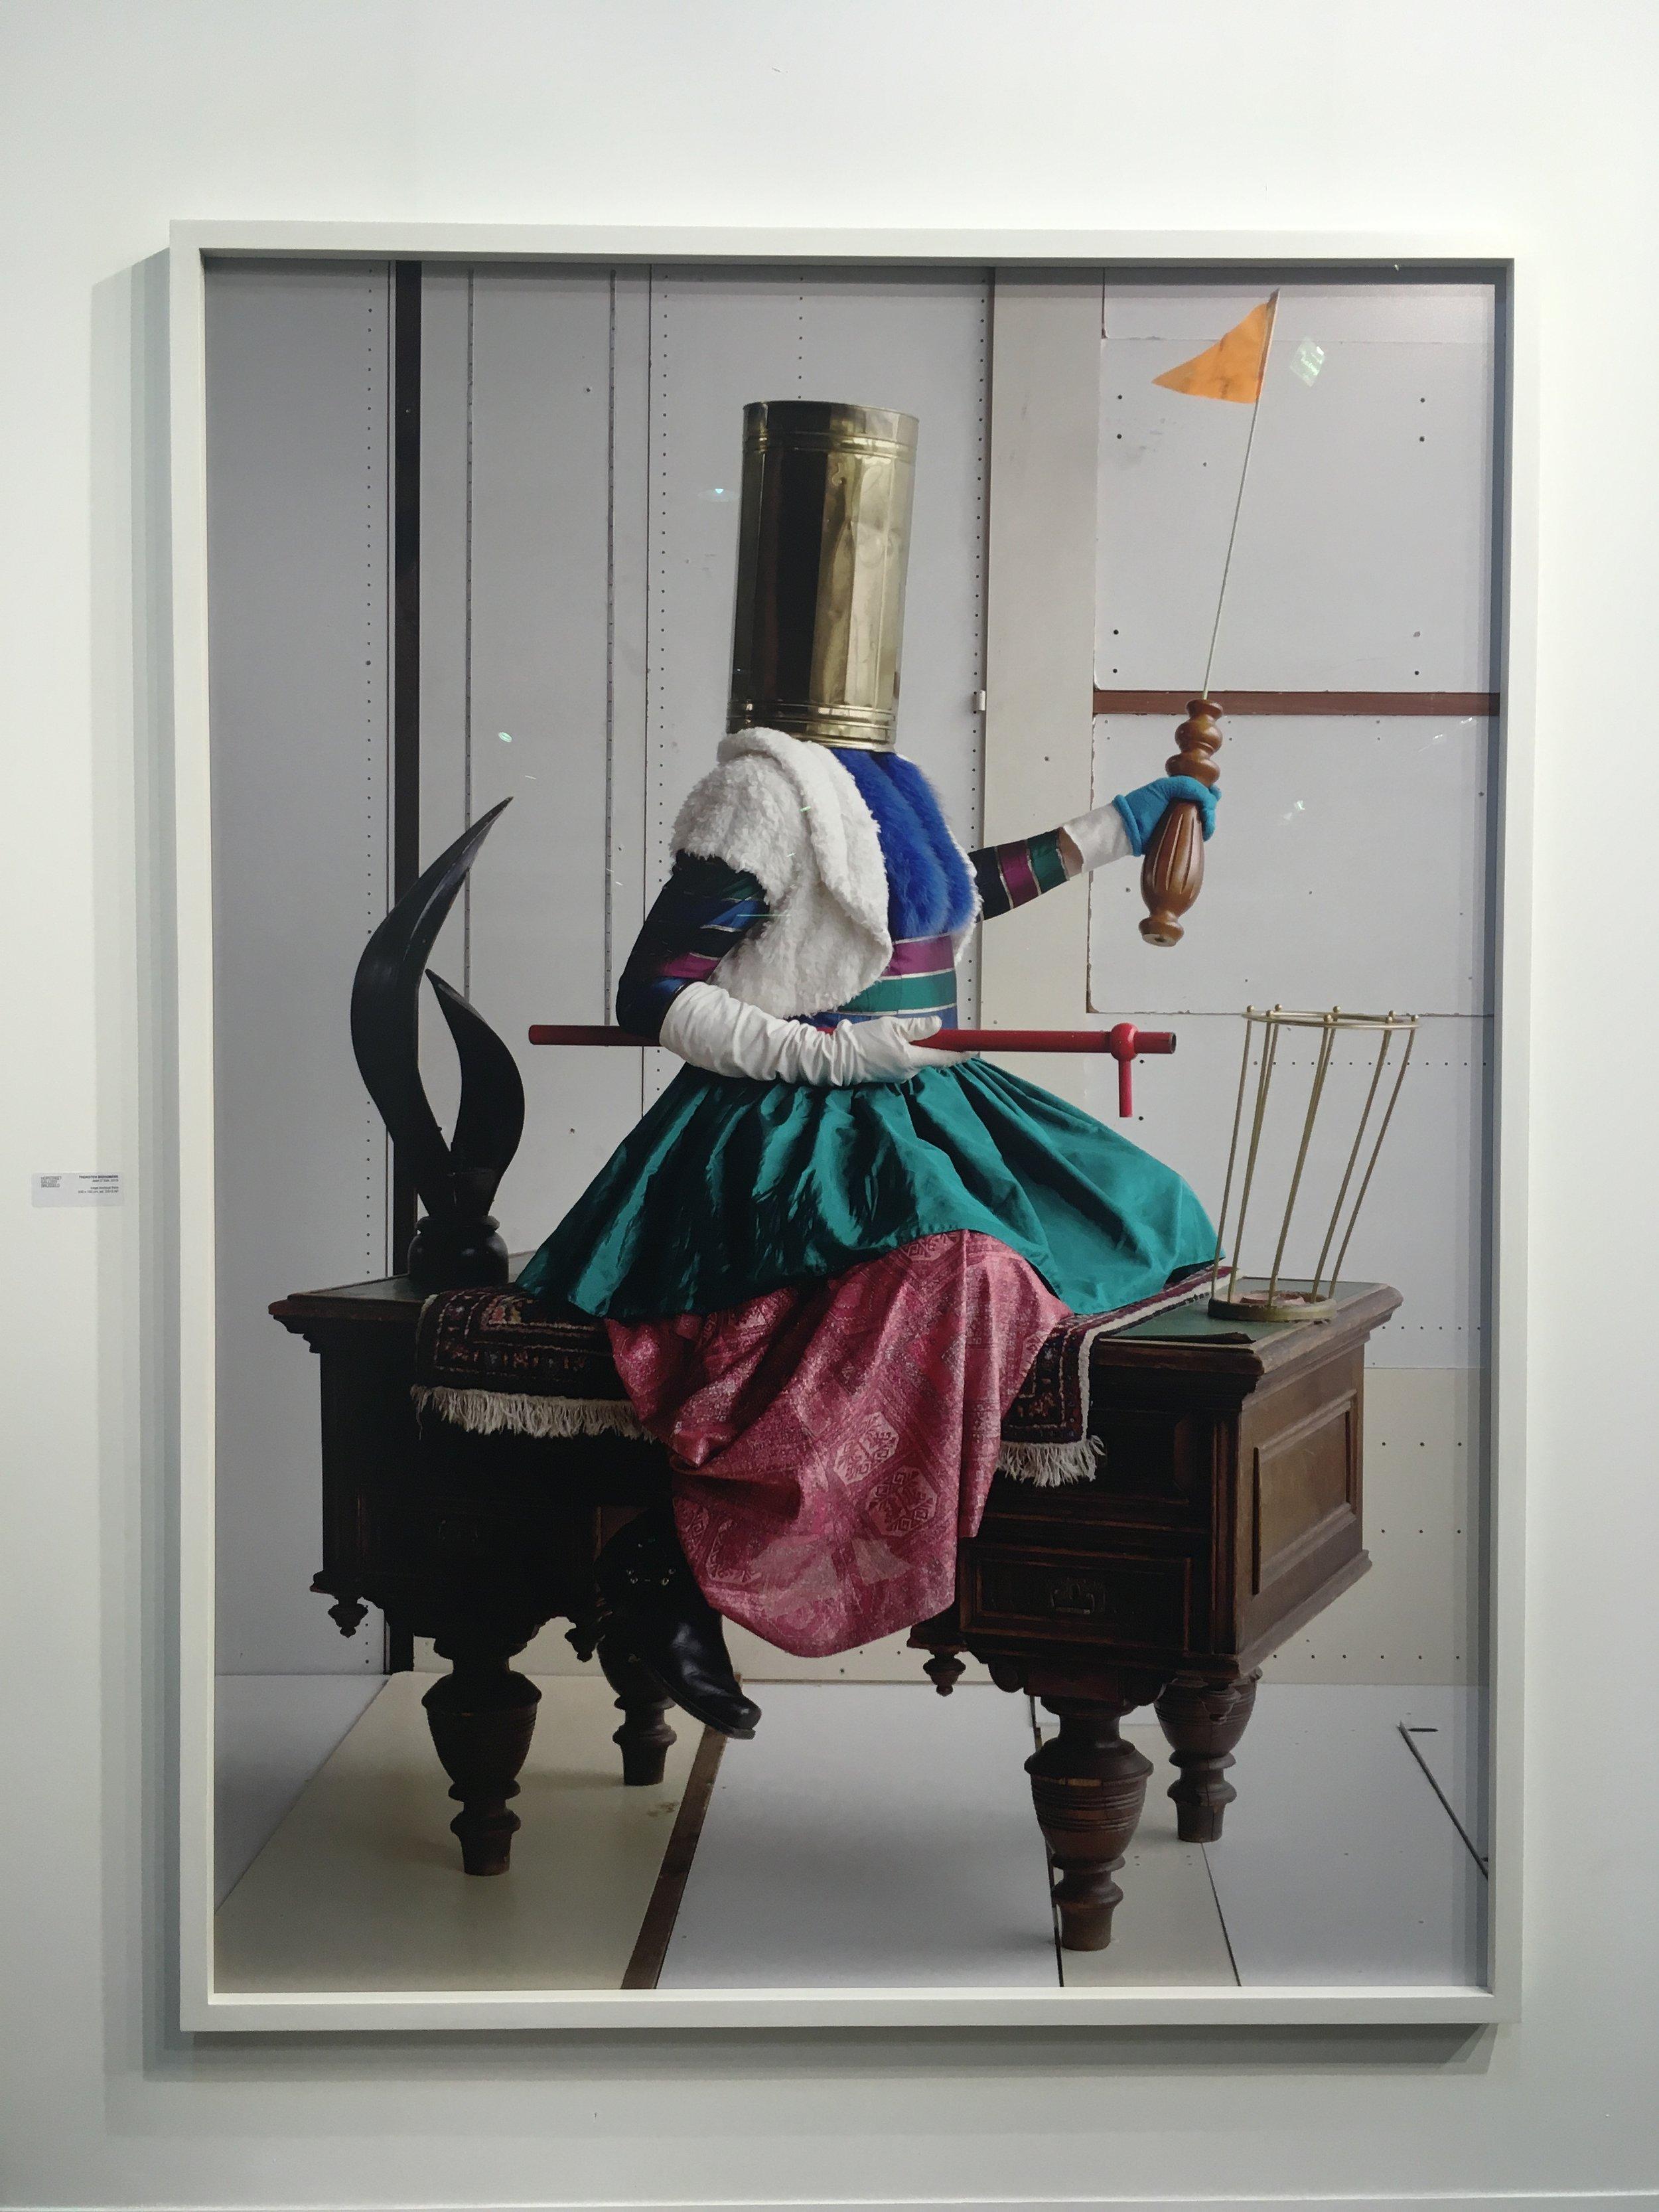 Thorsten Brinkmann / Hopstreet Gallery Brussels